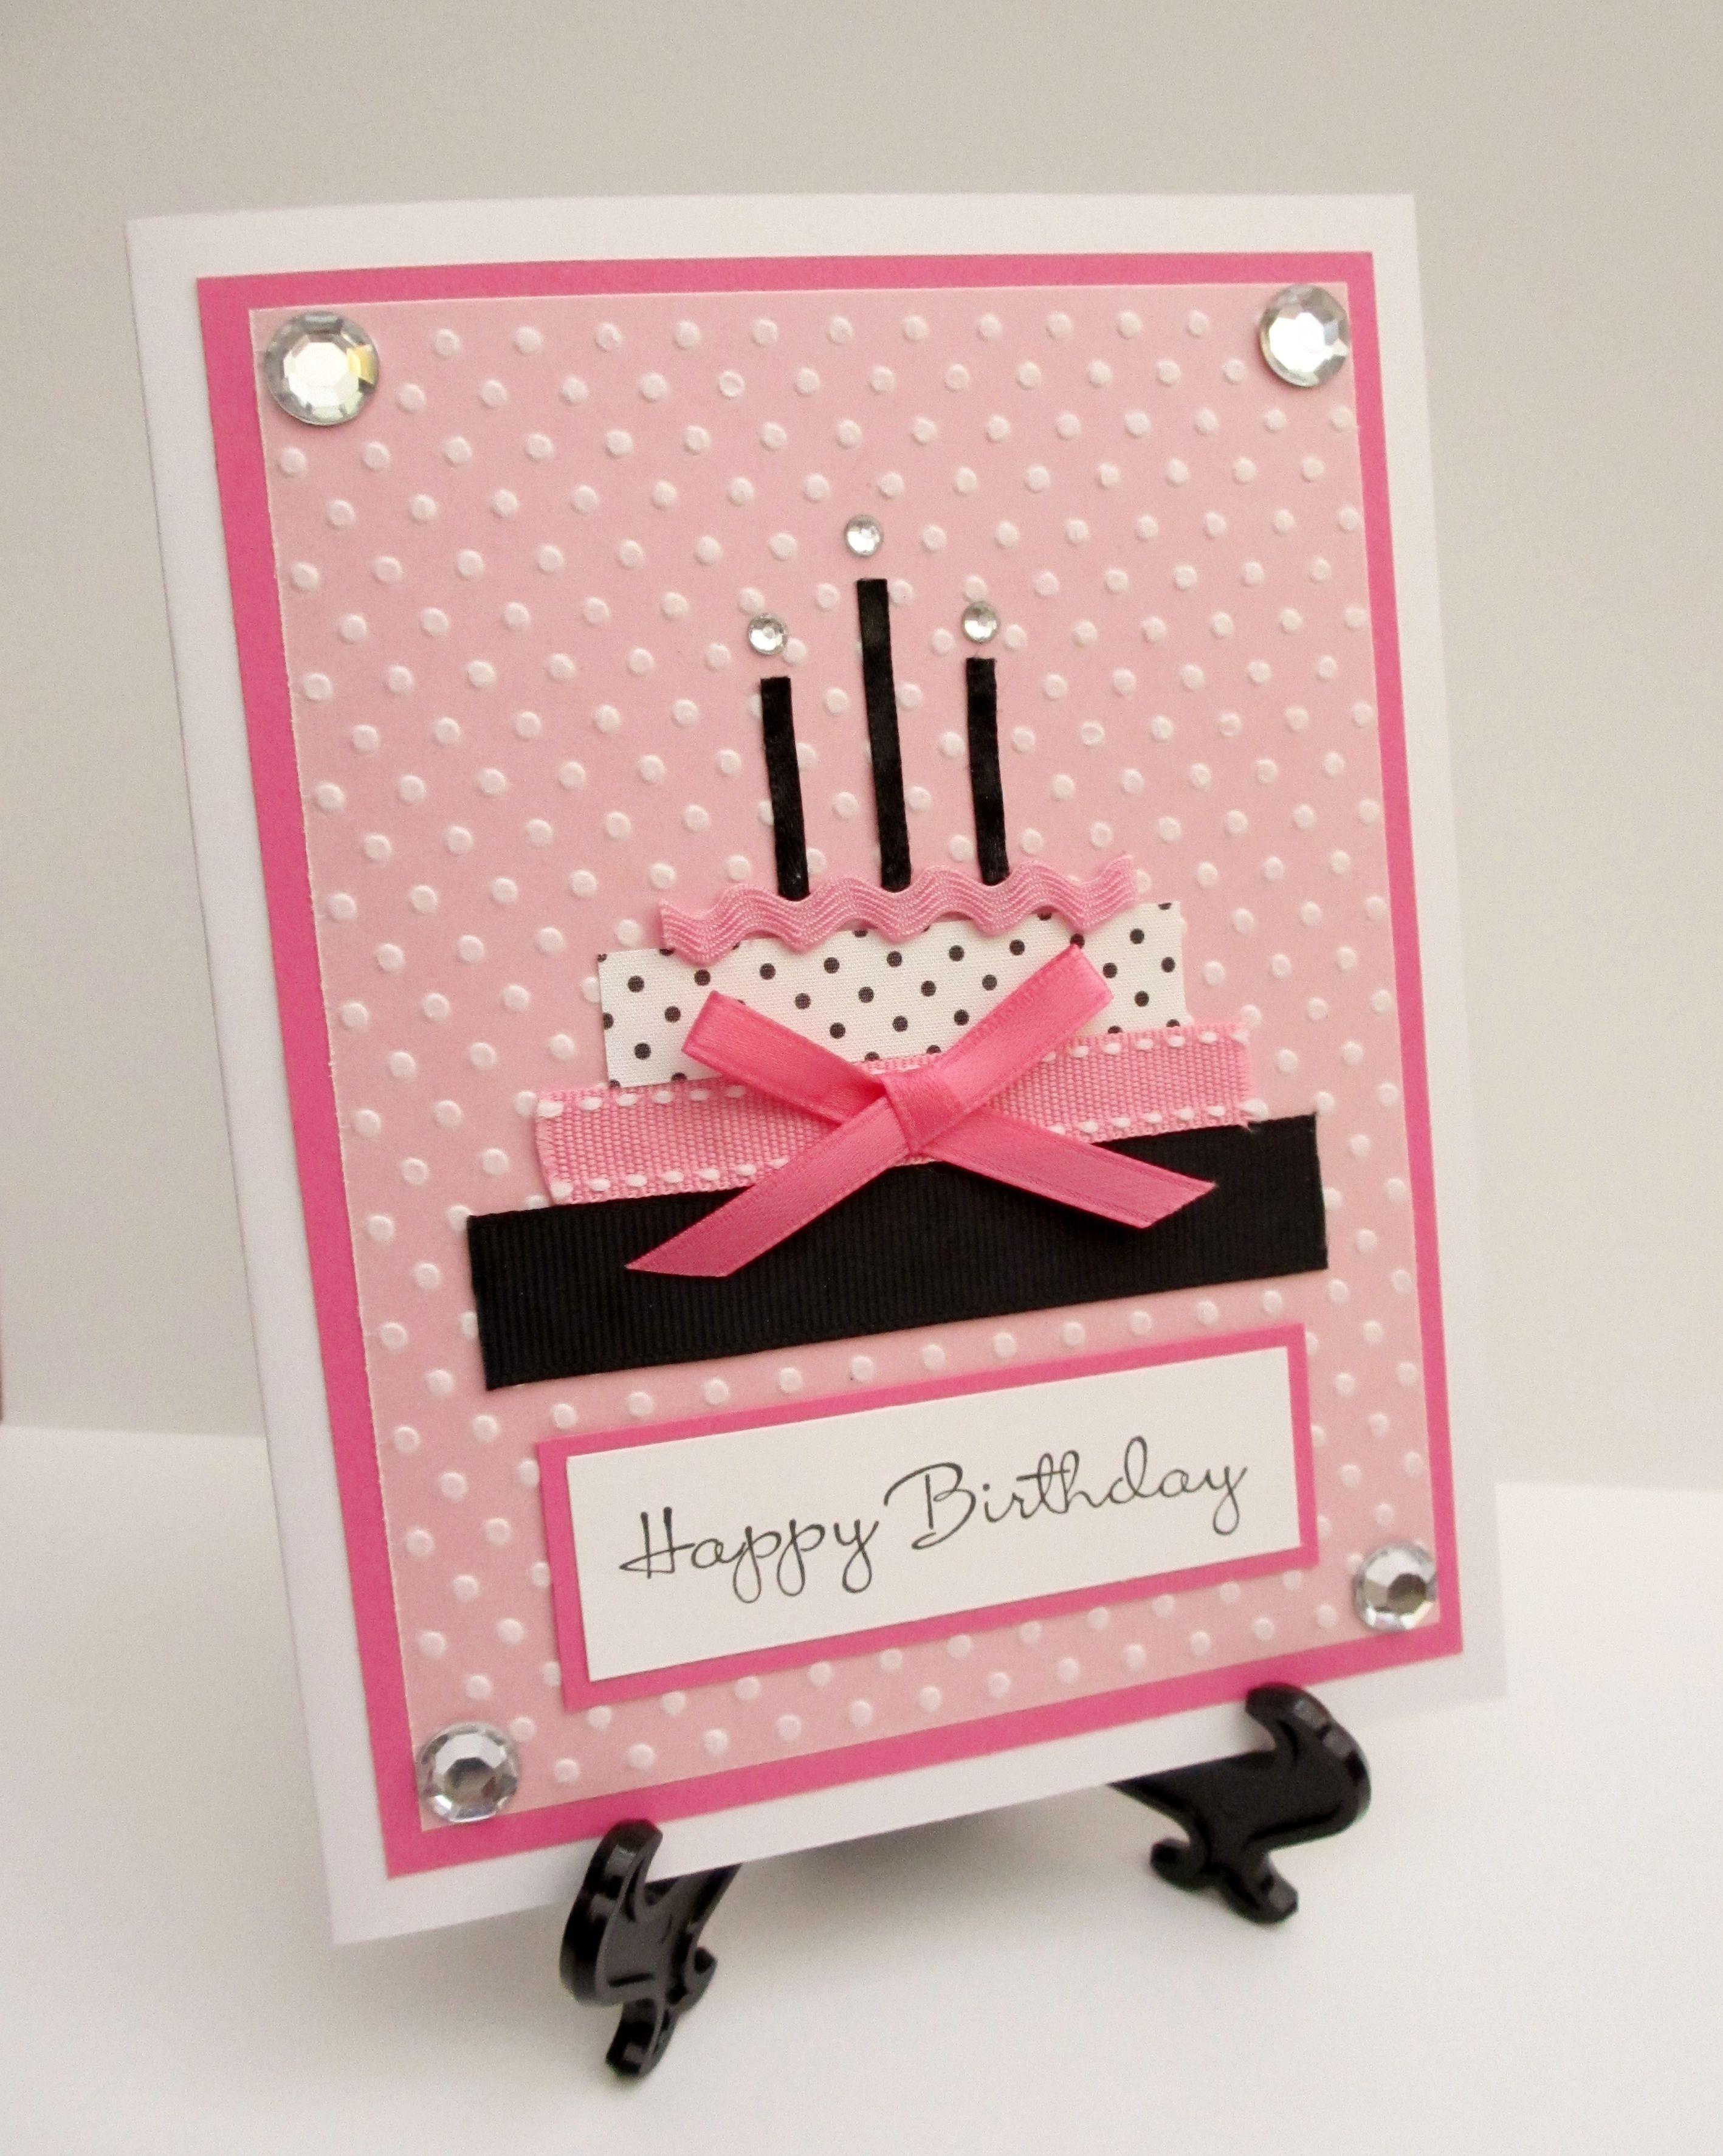 Handmade Sophisticated Pink Black Birthday Cake Card by Anything – Sophisticated Birthday Cards